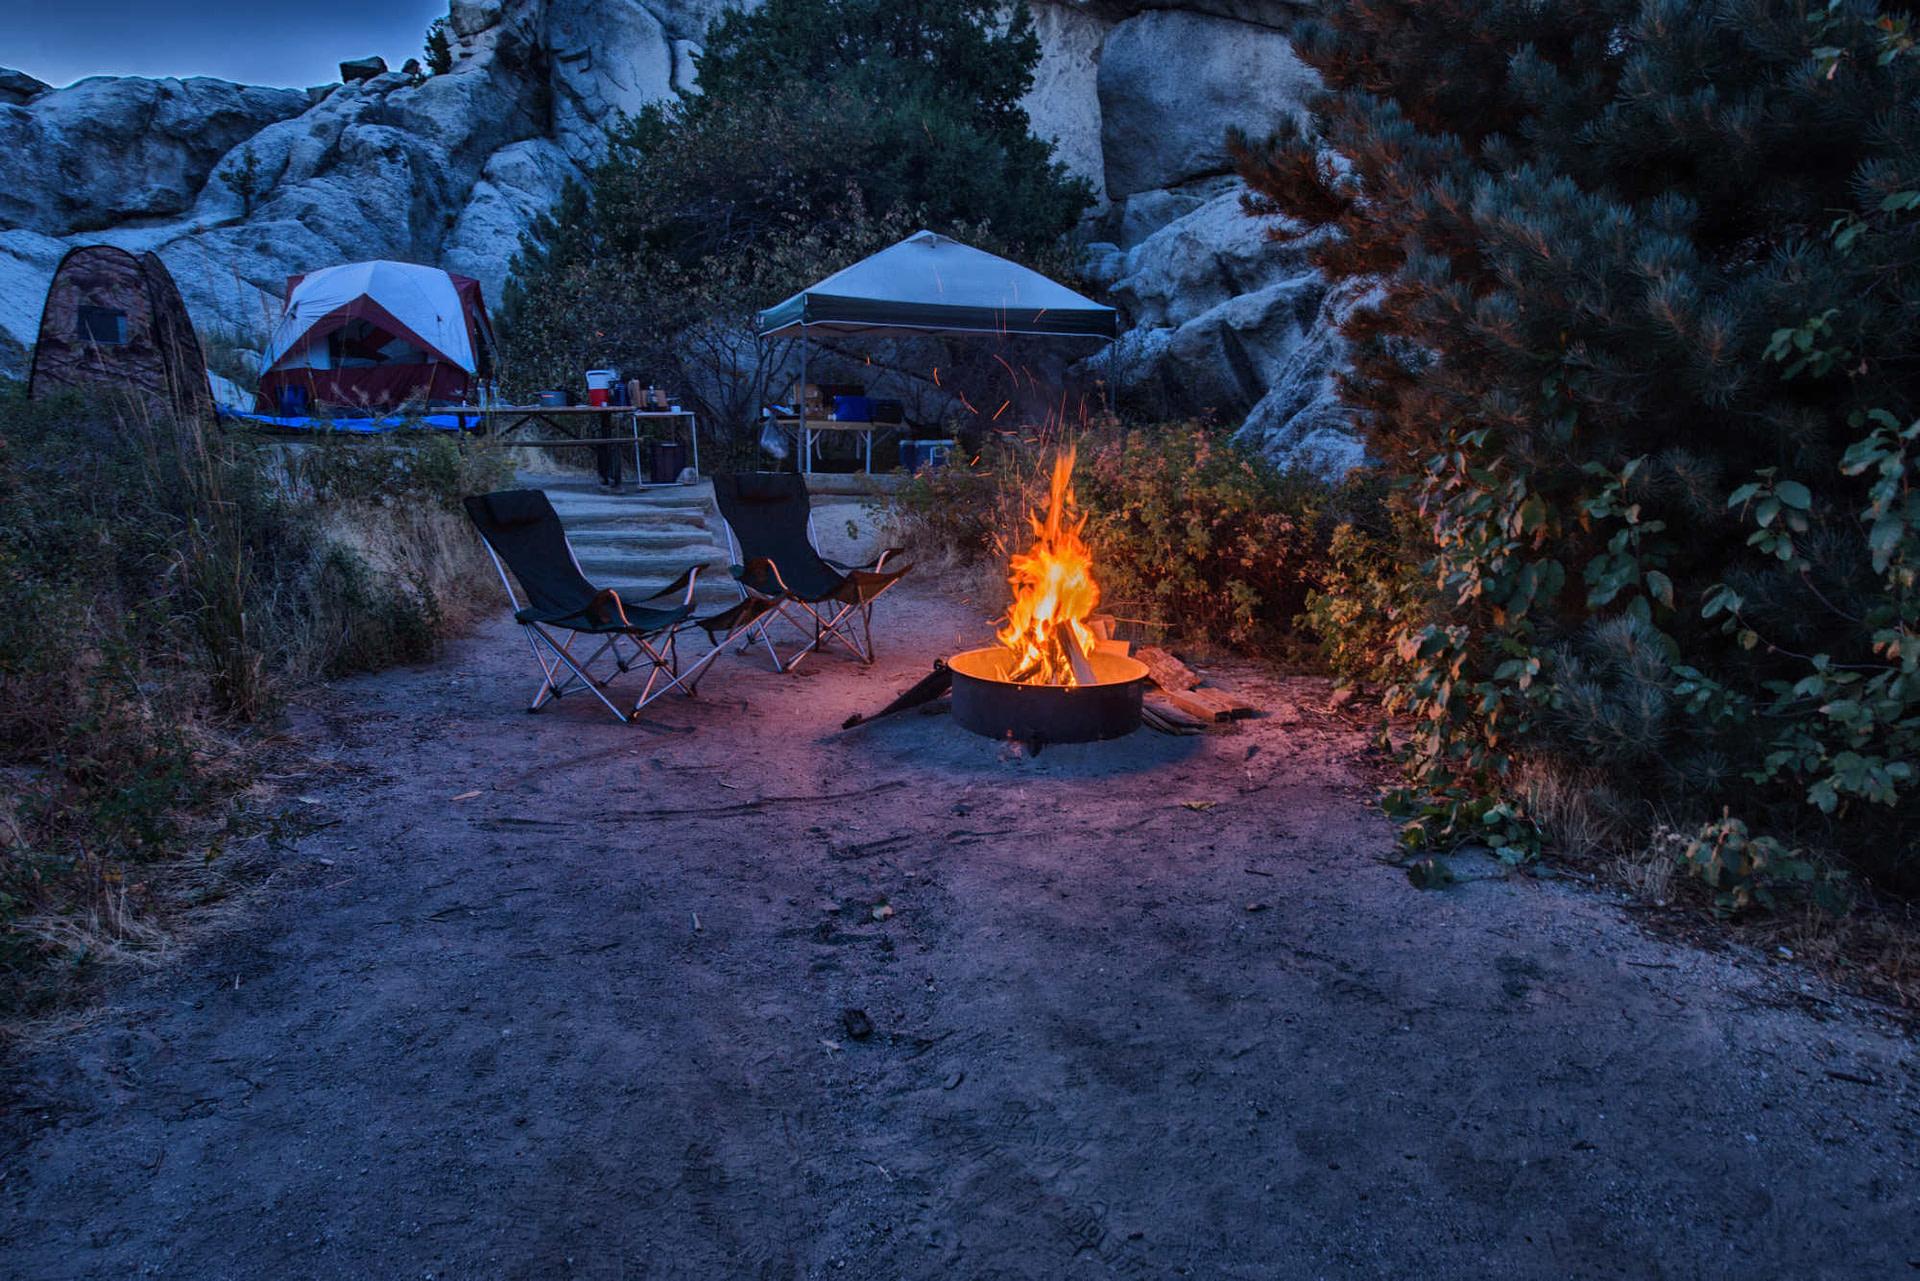 camping-JHWTZP2